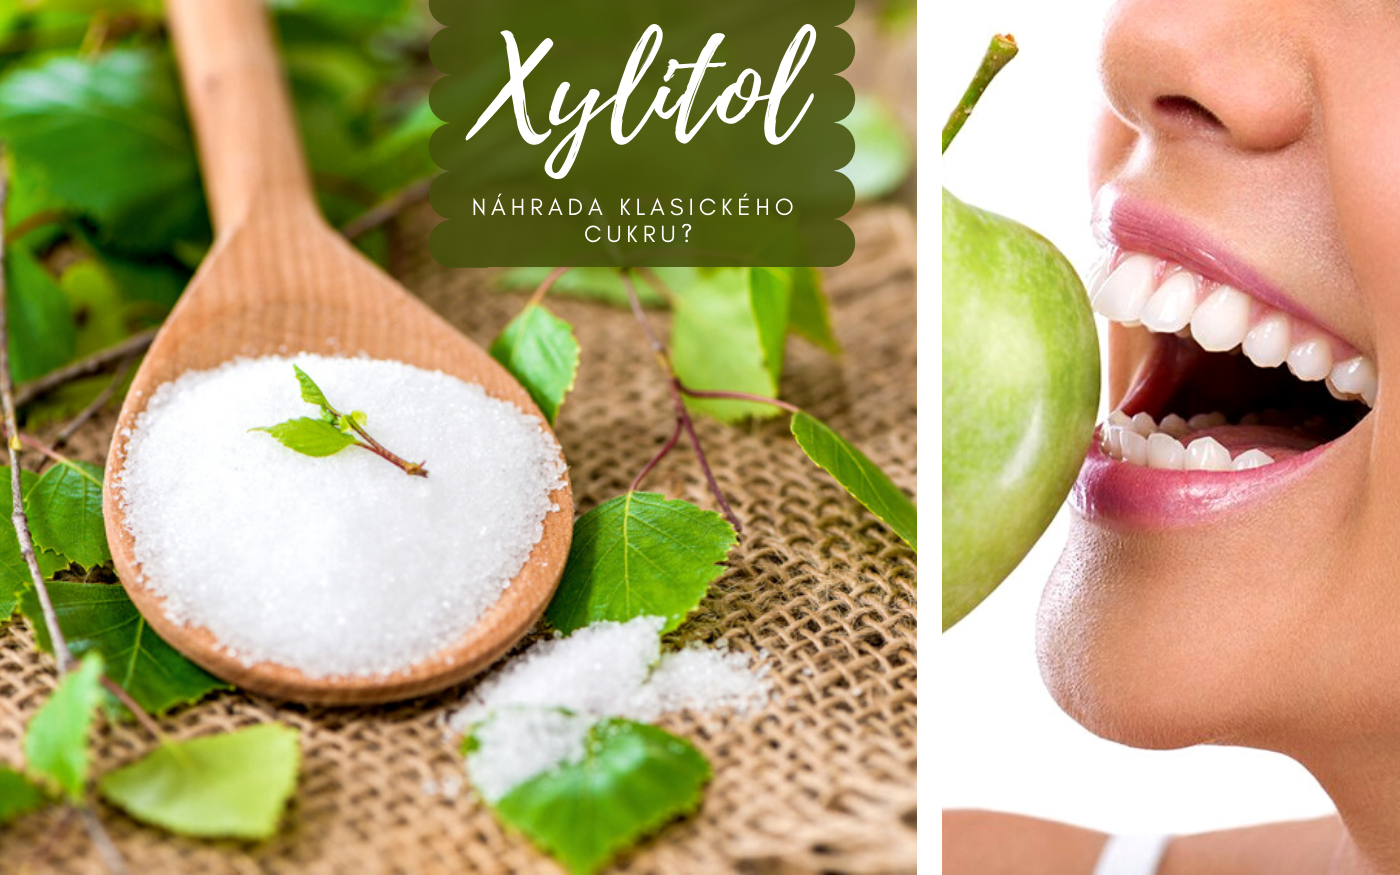 Xylitol - náhrada klasického cukru?